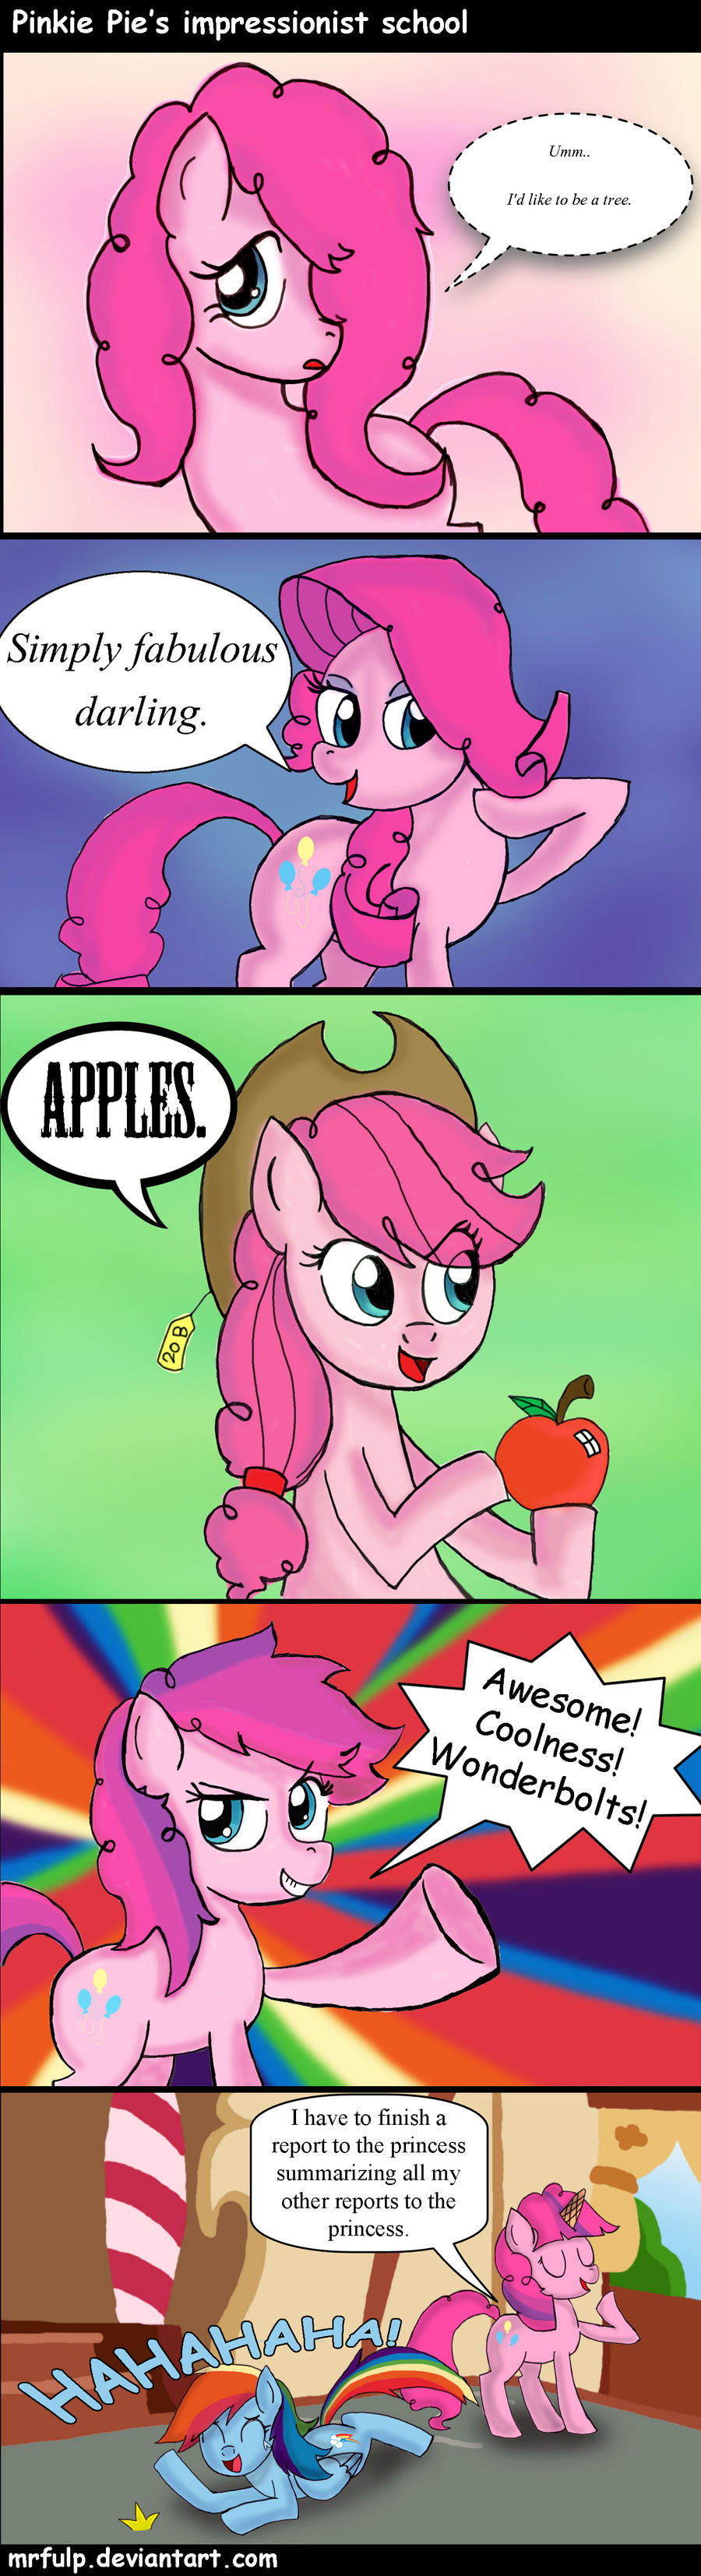 Pinkie Pie's Impressionist School by MrFulp